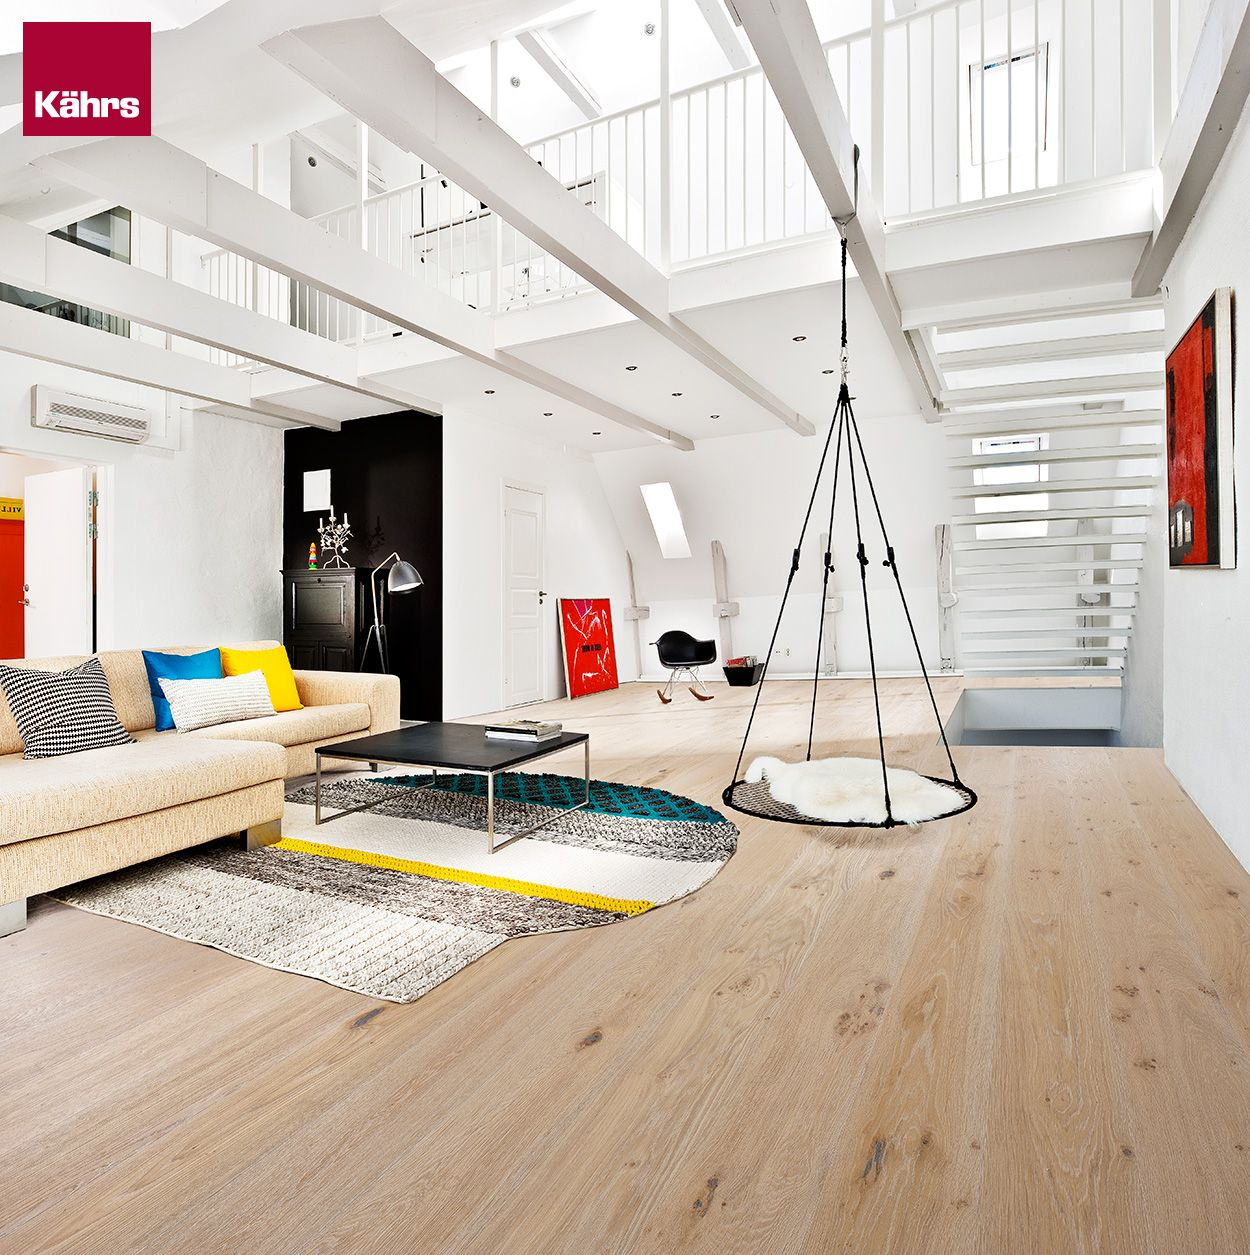 your style one choice k hrs oak valois k hrs original. Black Bedroom Furniture Sets. Home Design Ideas